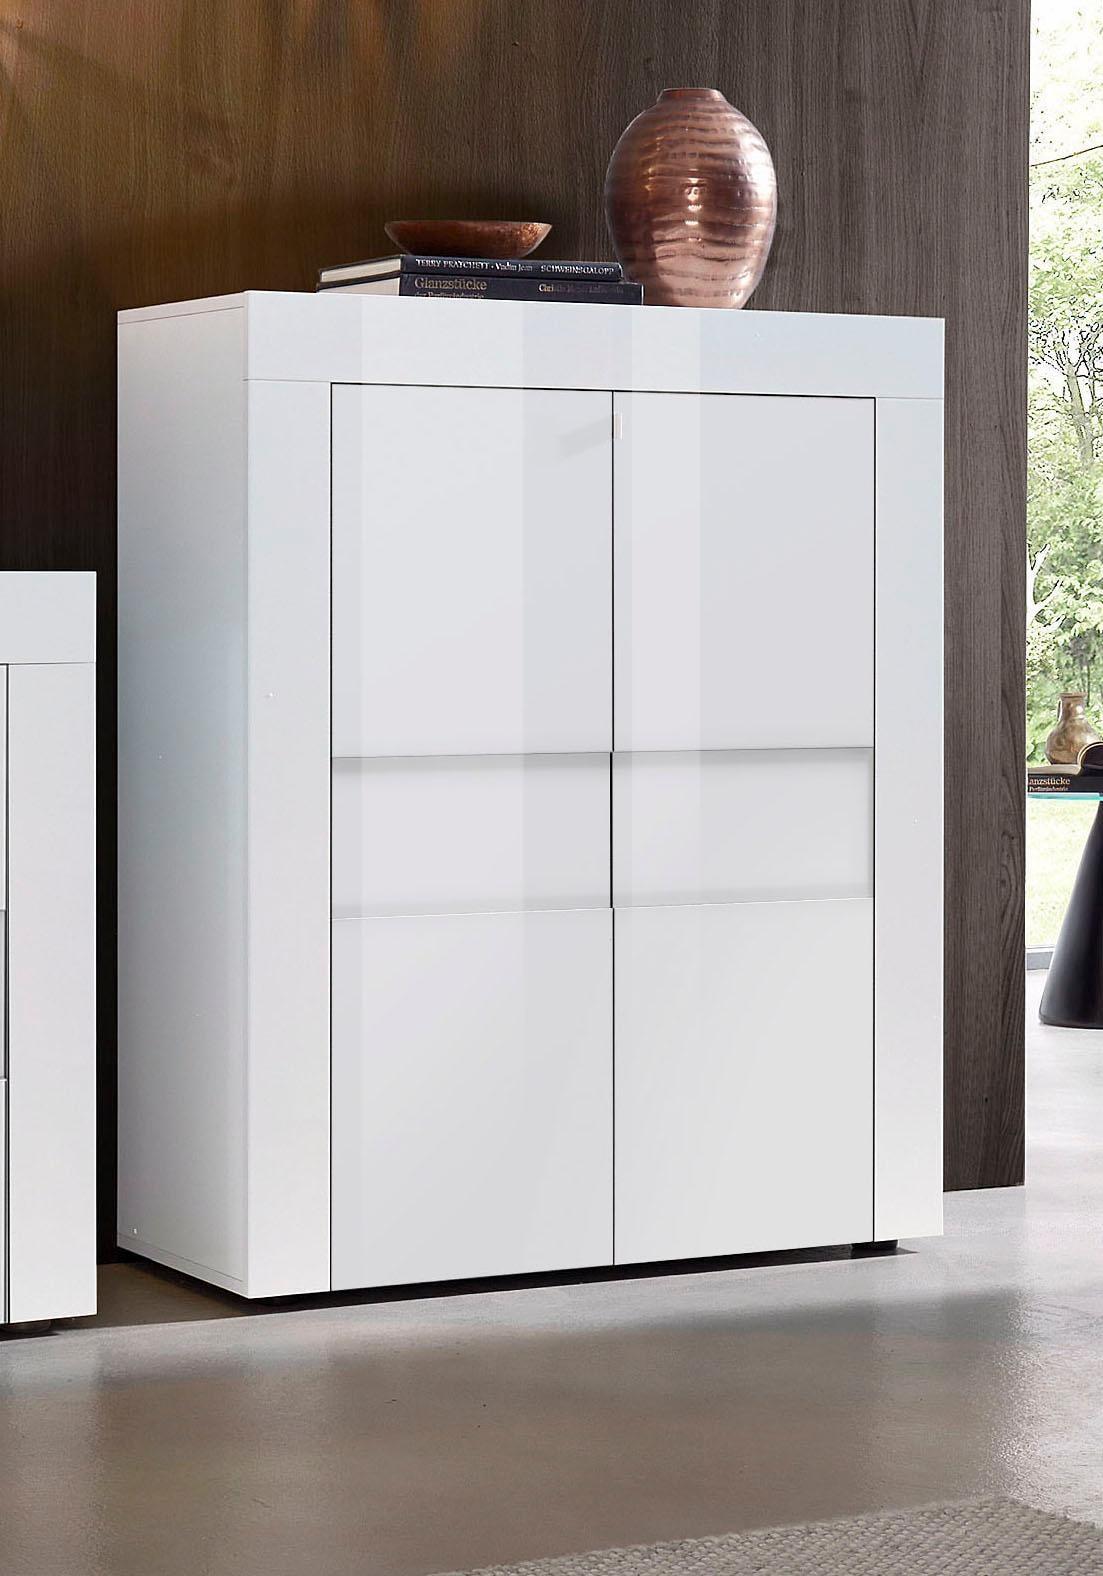 lc easy highboard breite 92 cm kaufen baur. Black Bedroom Furniture Sets. Home Design Ideas